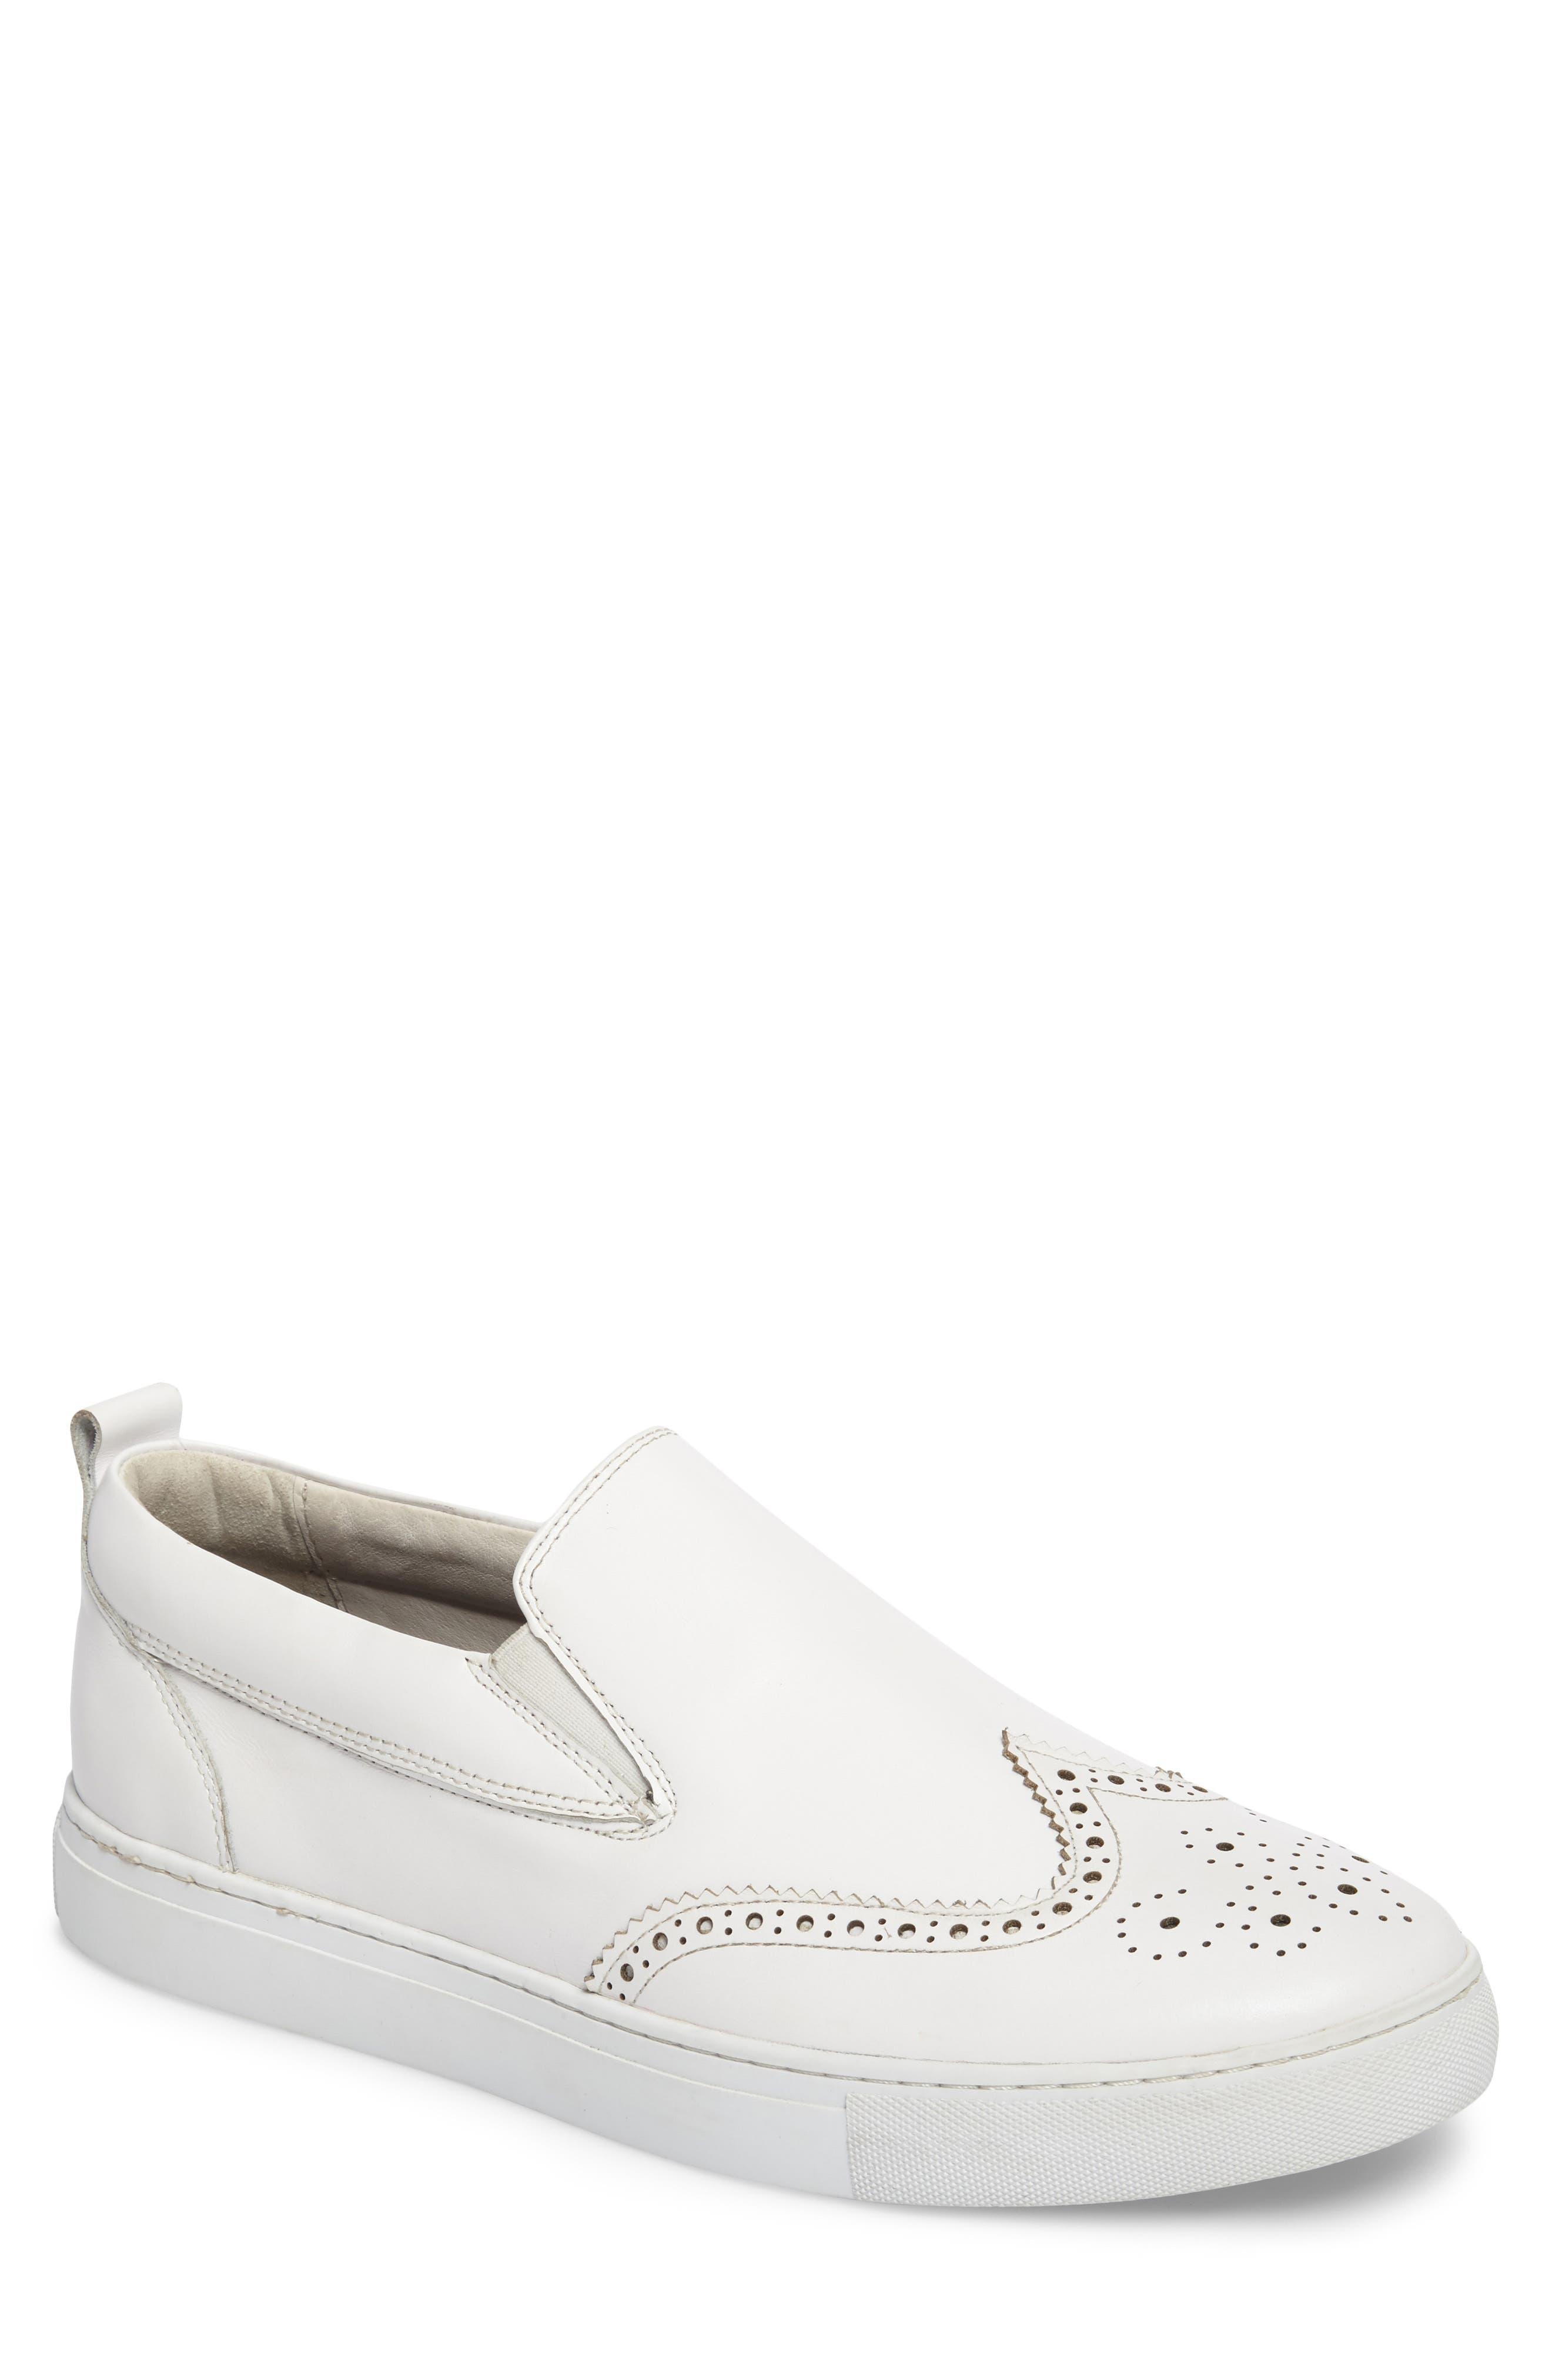 Ali Wingtip Slip-On Sneaker,                         Main,                         color, White Leather